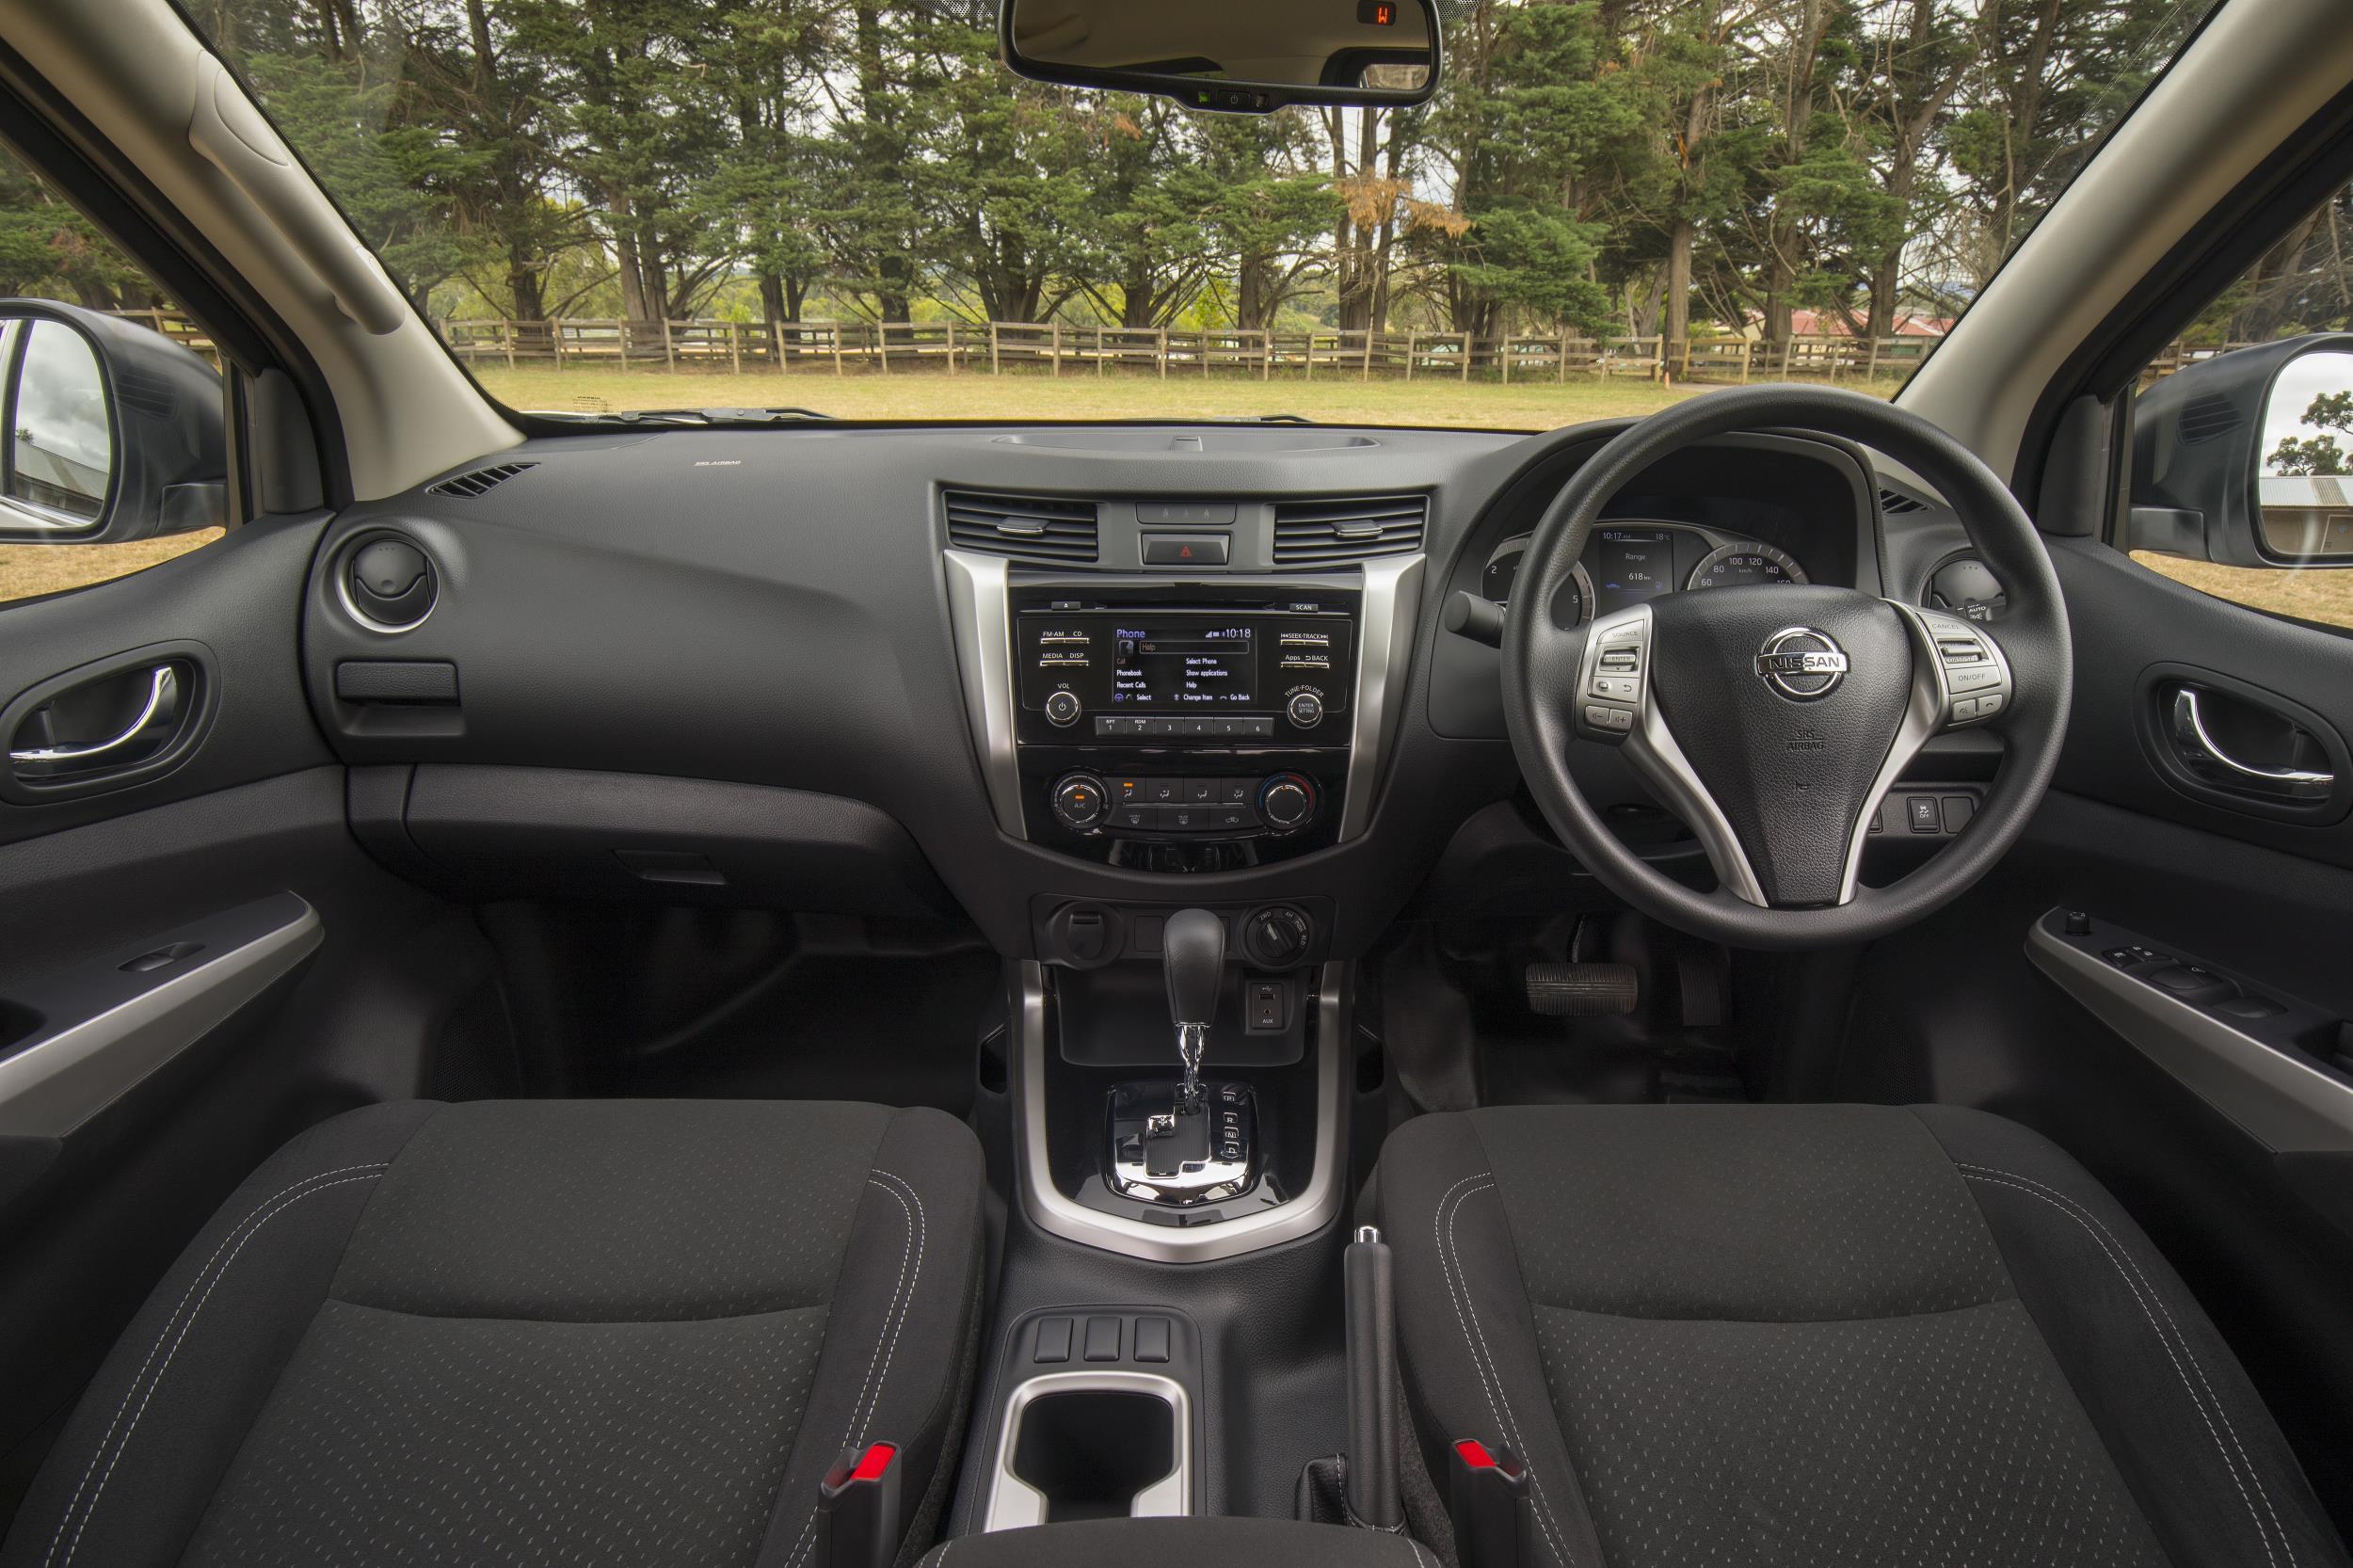 2018 Nissan Navara SL-interior |